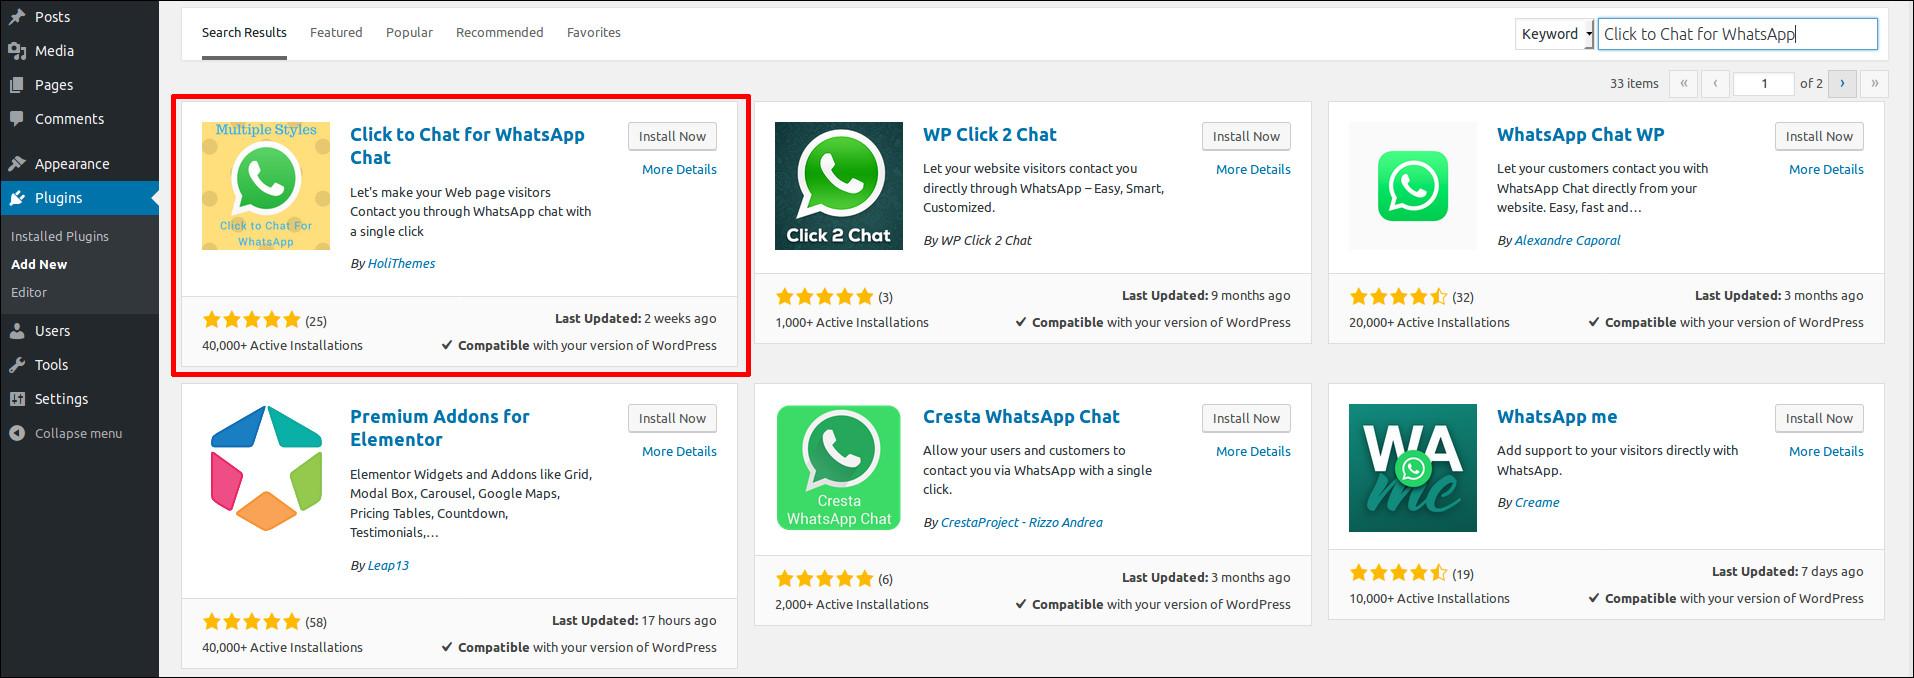 How to add WhatsApp Chat to WordPress | HostOnNet com